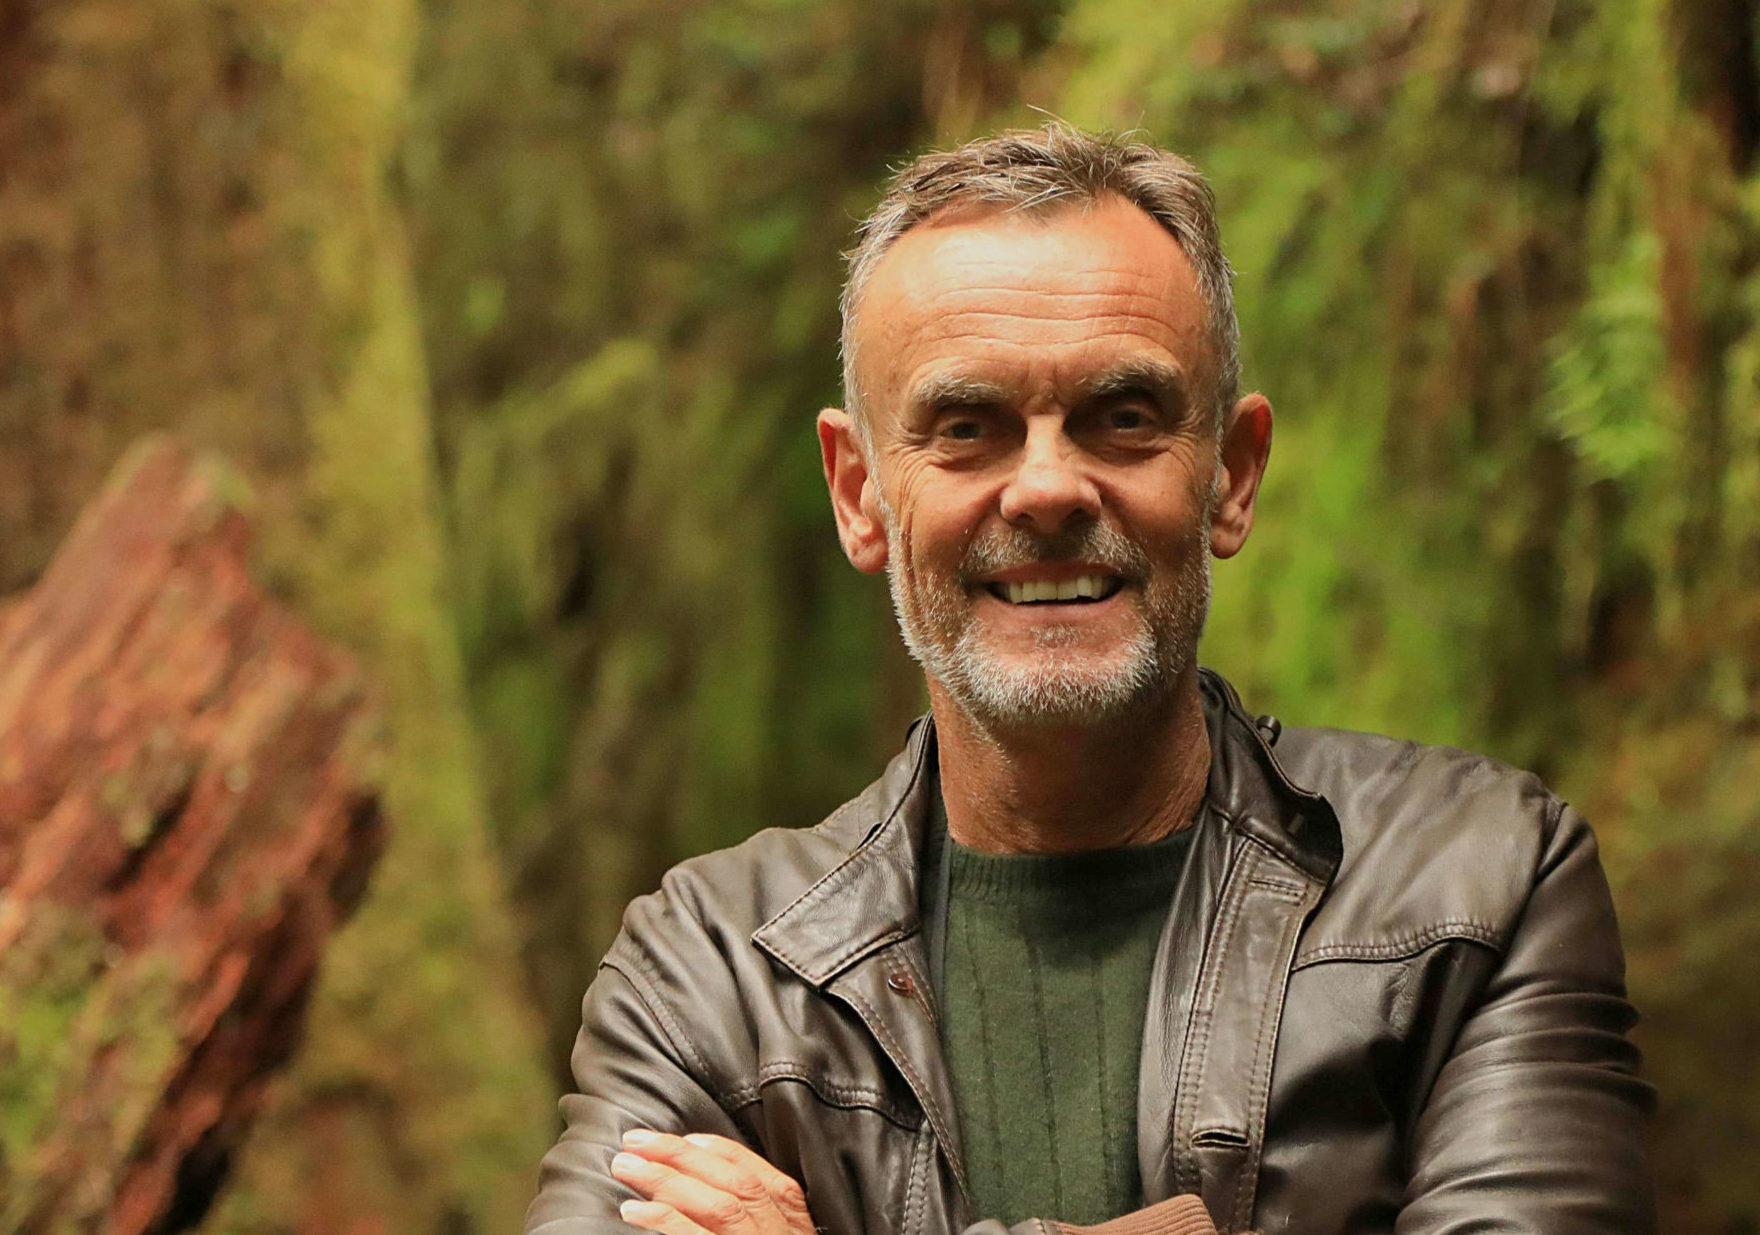 Paul Lister